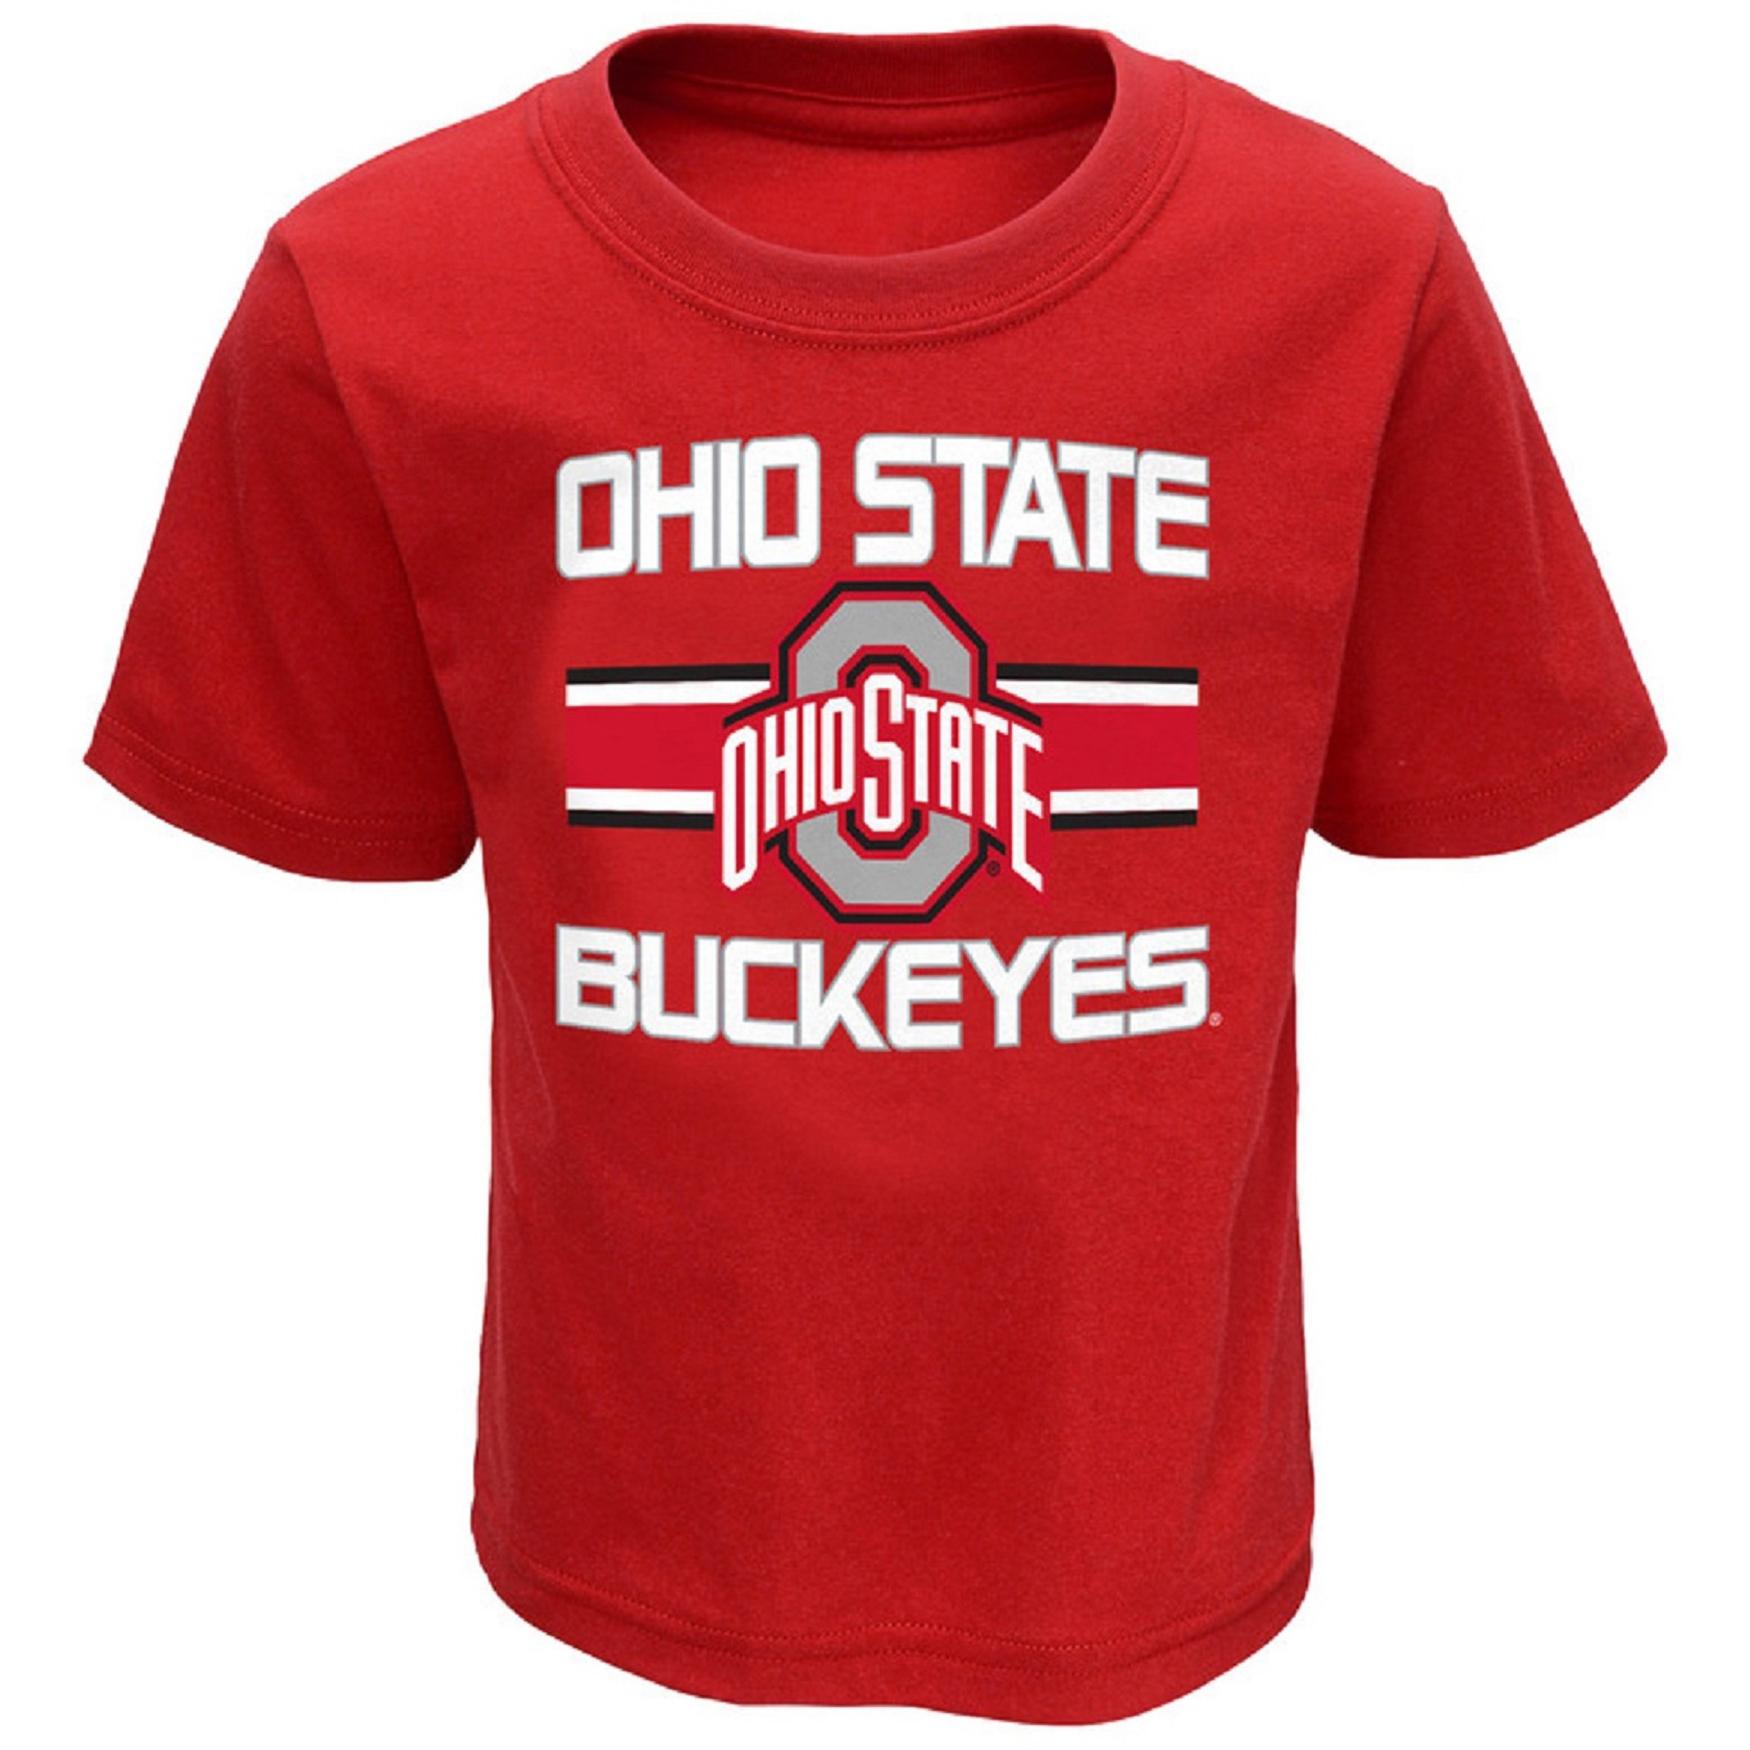 Toddler Scarlet Ohio State Buckeyes Mascot T-Shirt